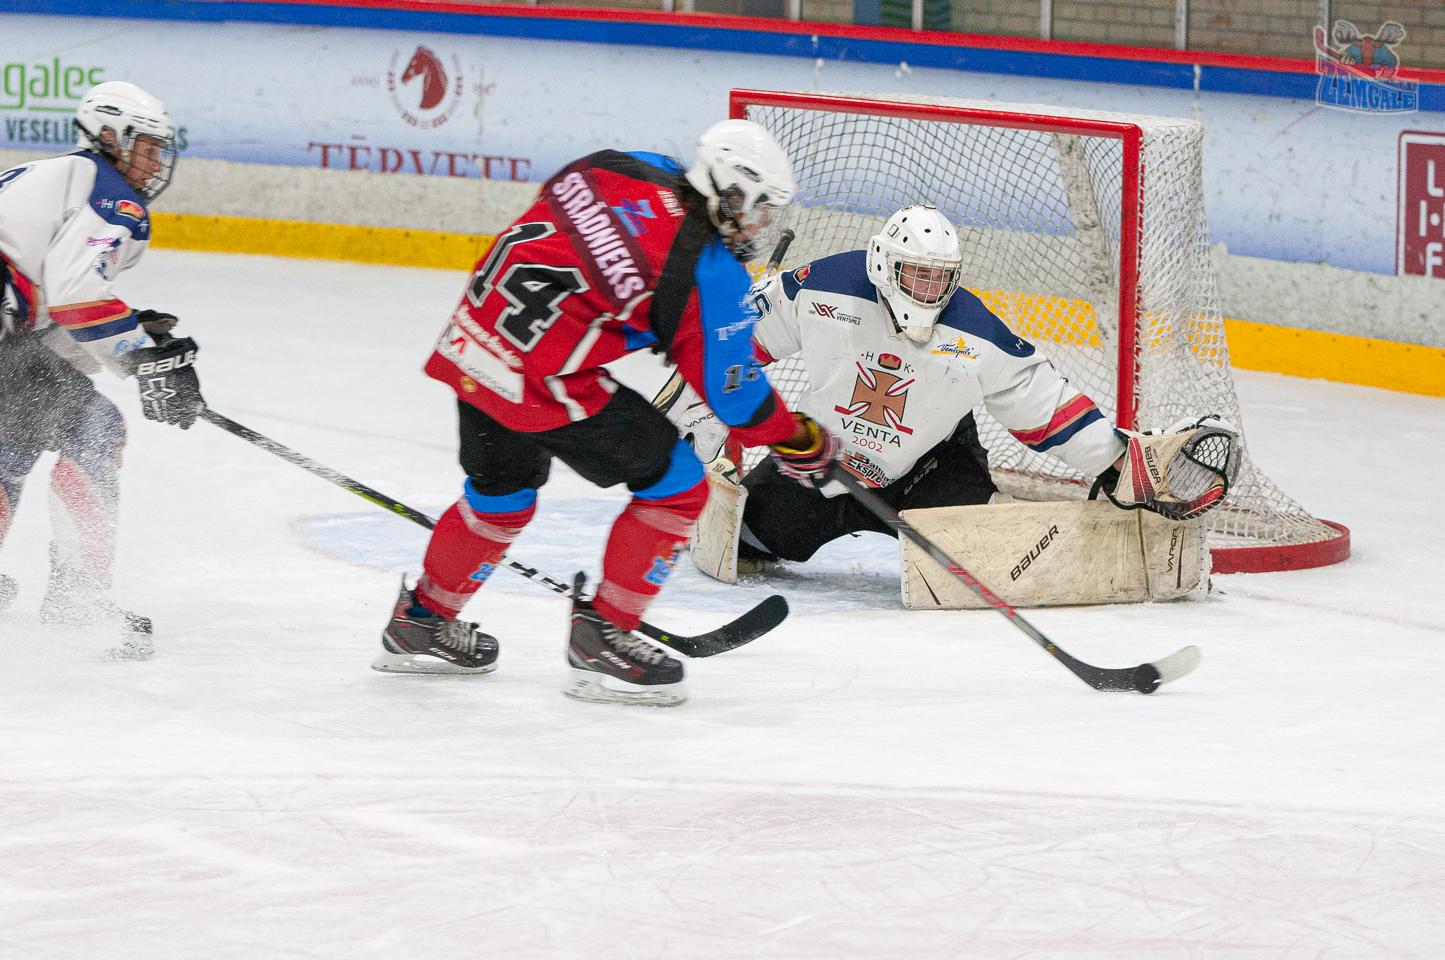 Jelgavas hokeja skola JLSS U17 - Venta 2002 14092019-08